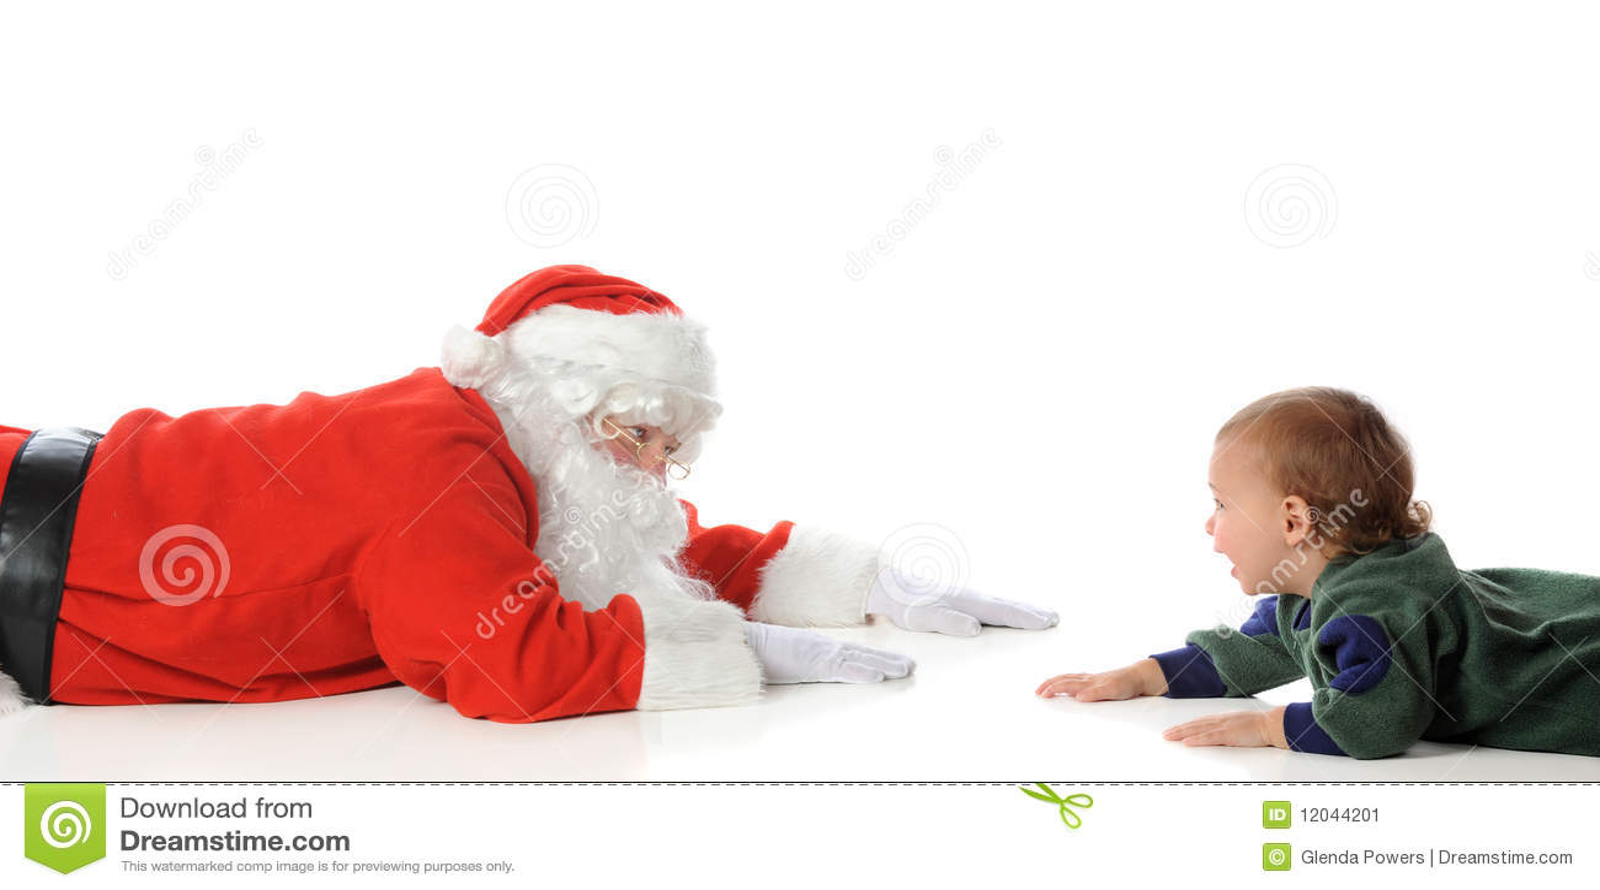 a2950dd15d Santa Playing with Toddler stock image. Image of santa - 12044201